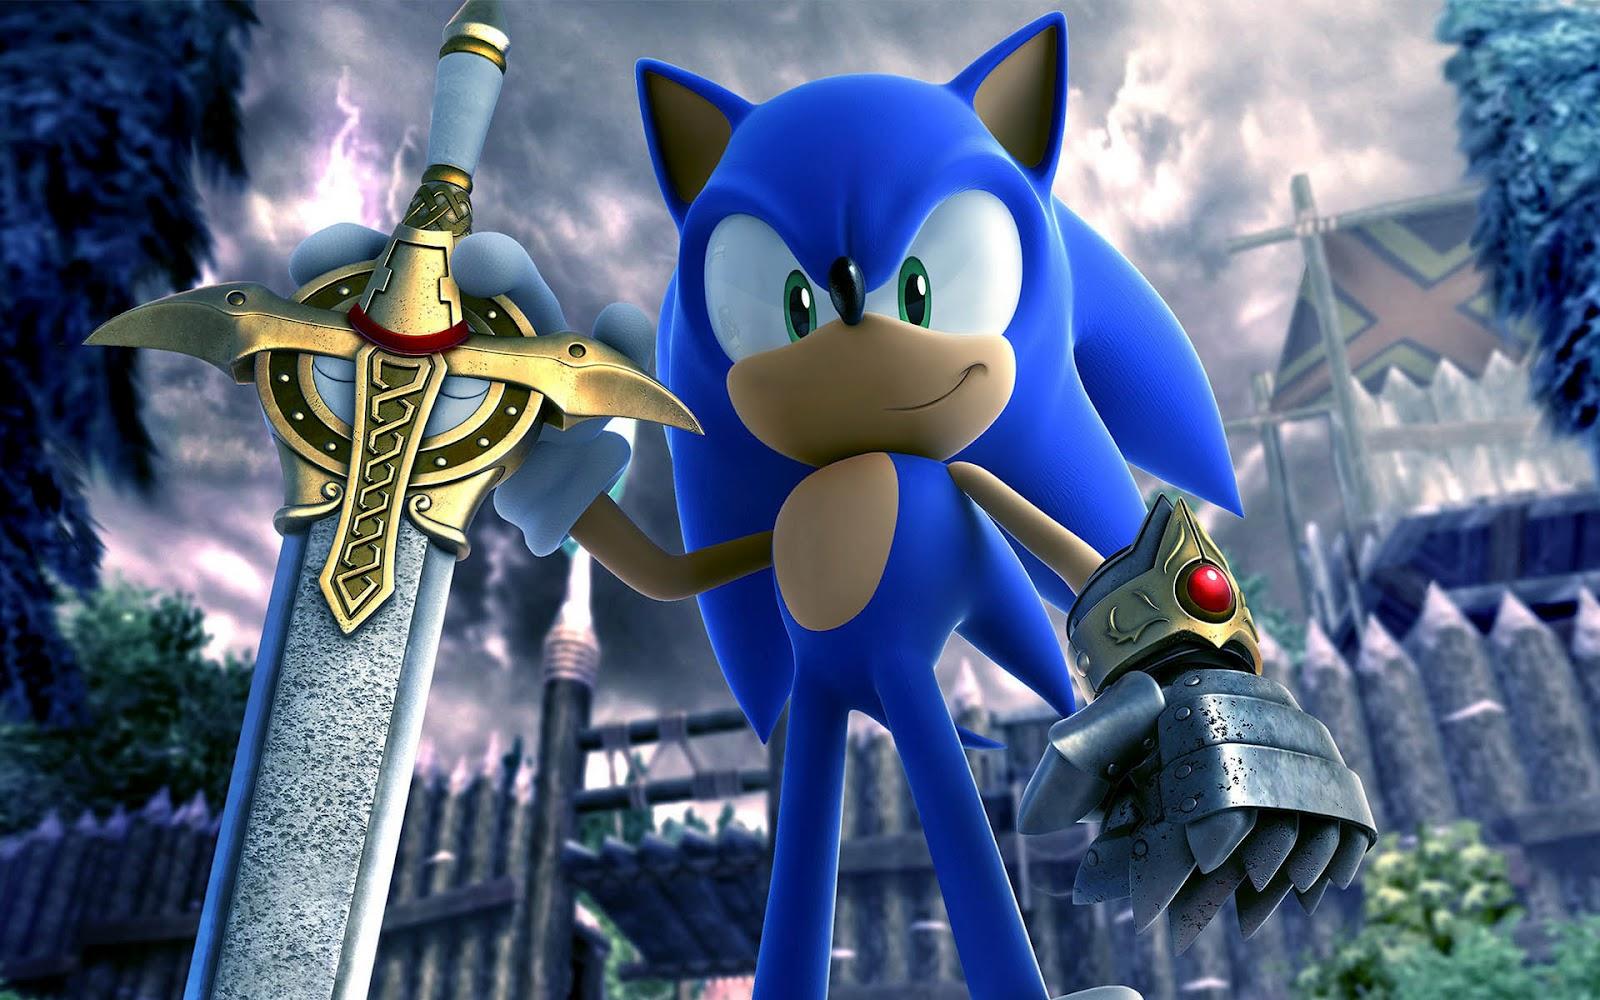 Sonic The Hedgehog Iphone Wallpaper Oscargilabertecom